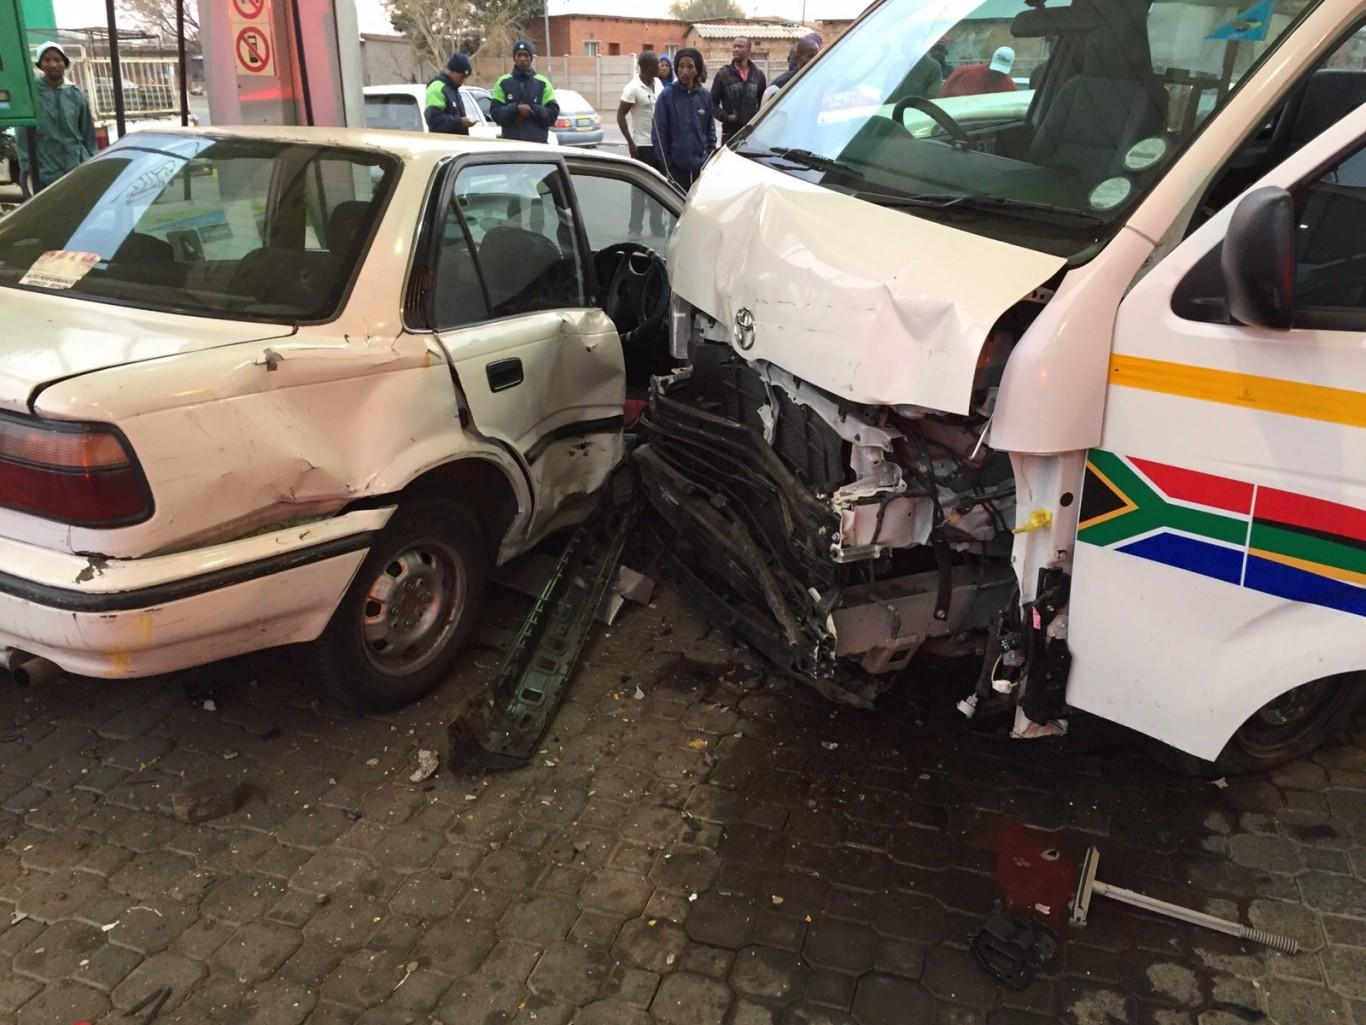 Petrol station collision, seven injured1